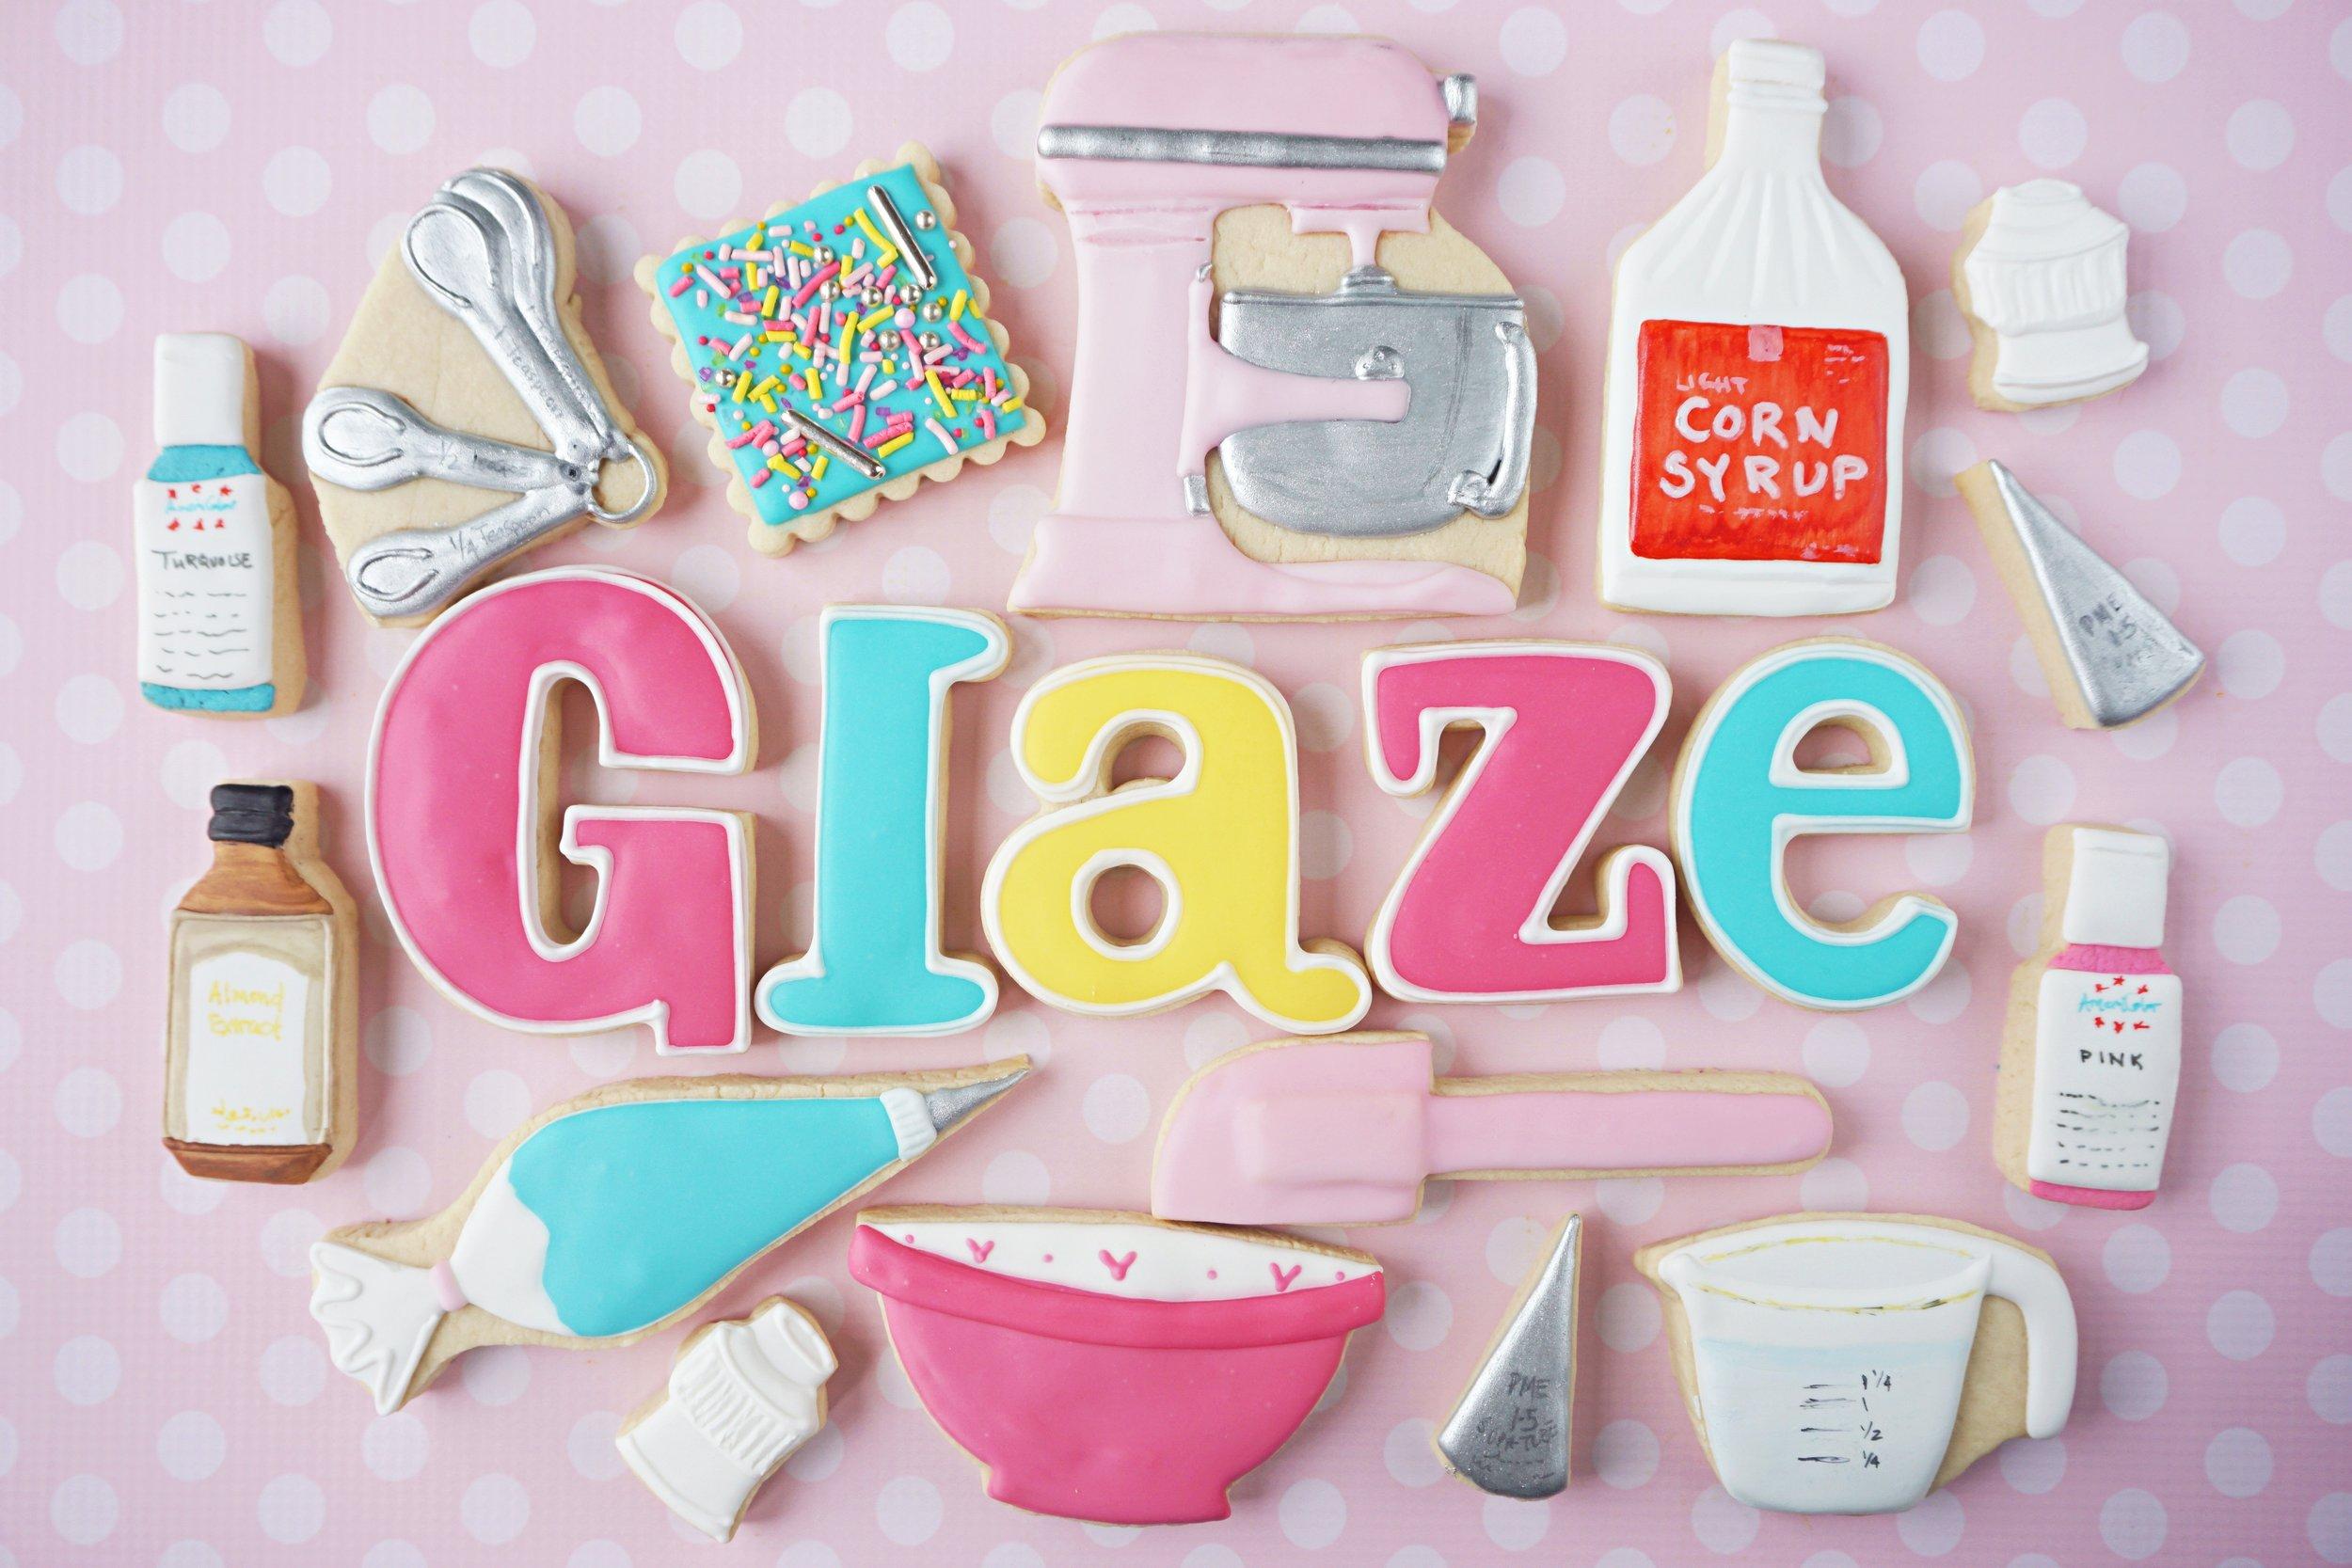 CookieCrazie Glaze Icing Recipe